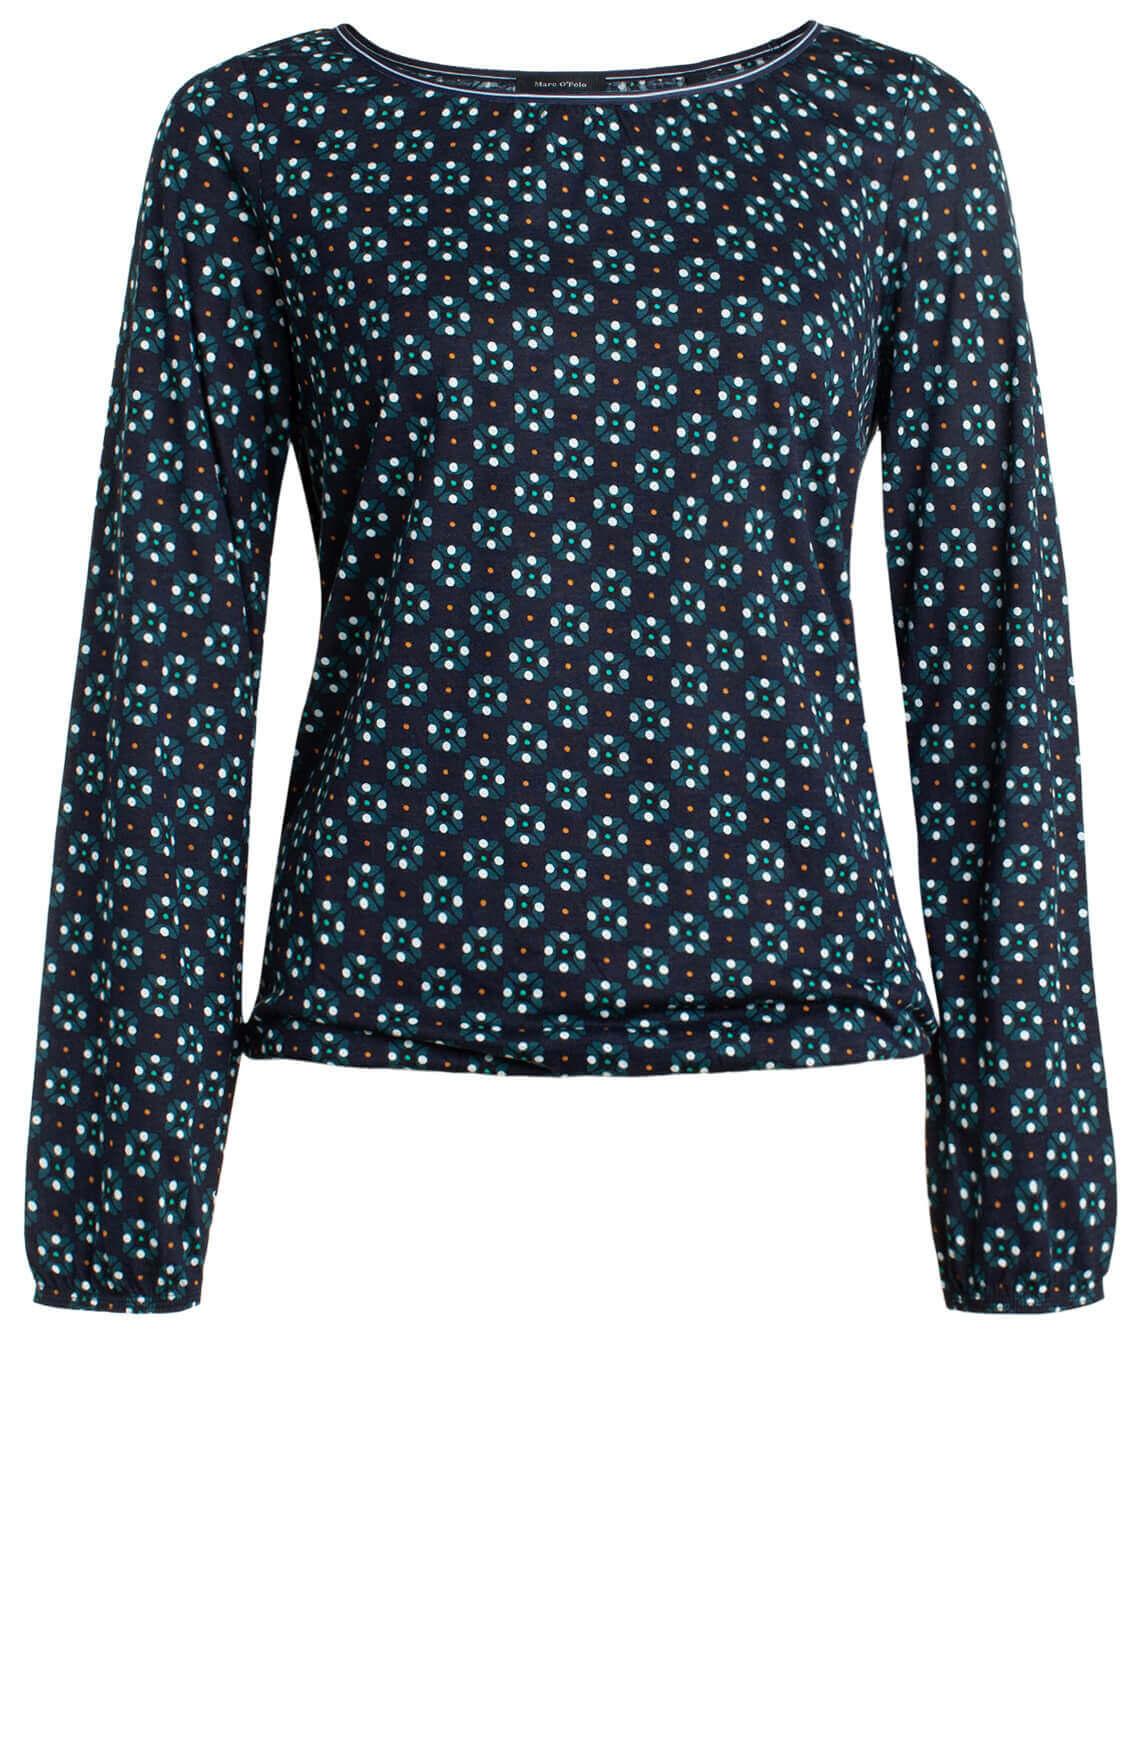 Marc O'Polo Dames Shirt met print Blauw